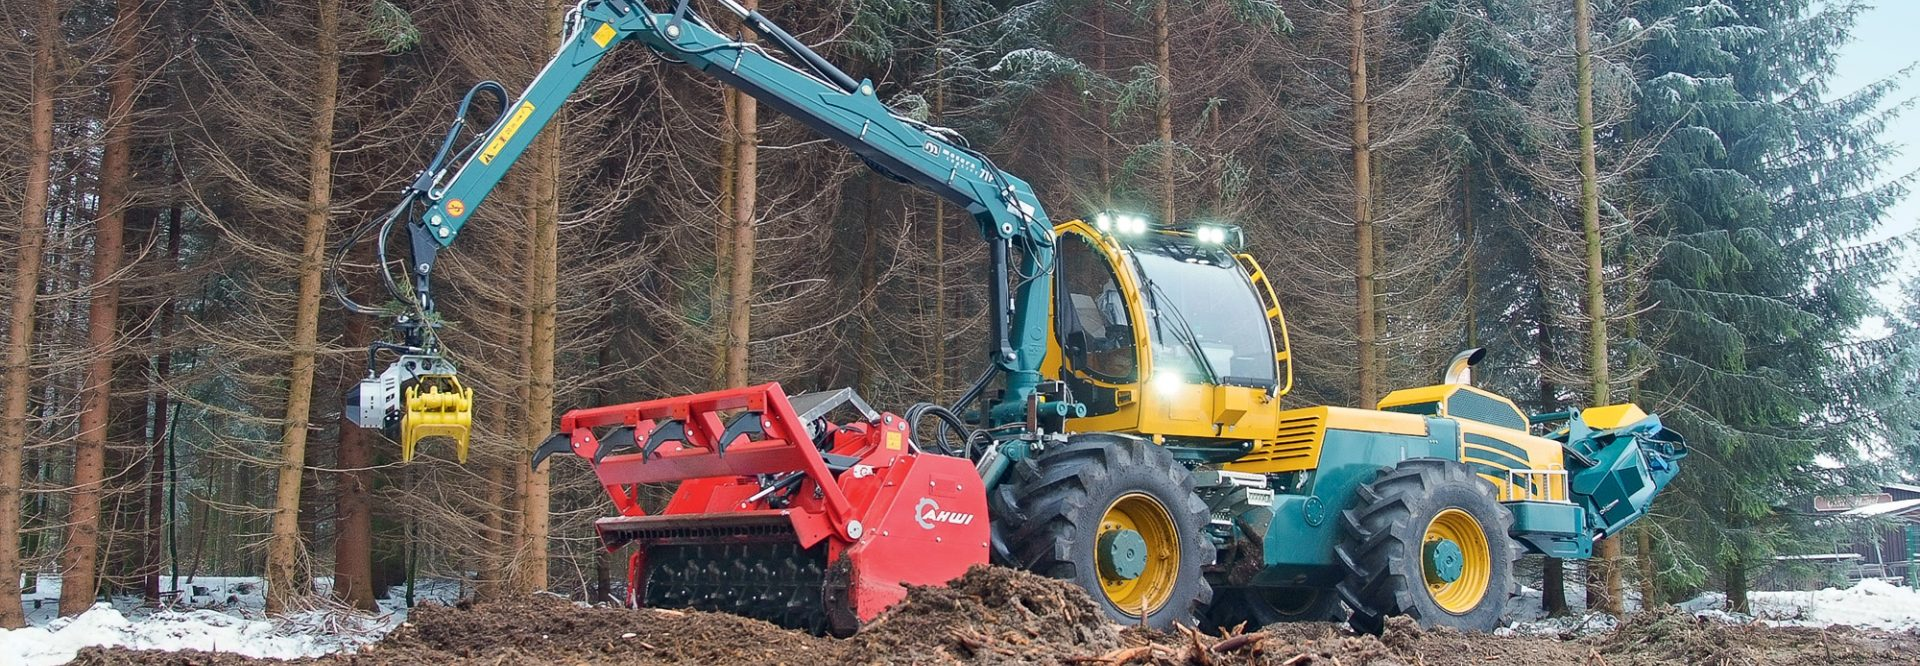 Inovforest | Forestry Equipment inc